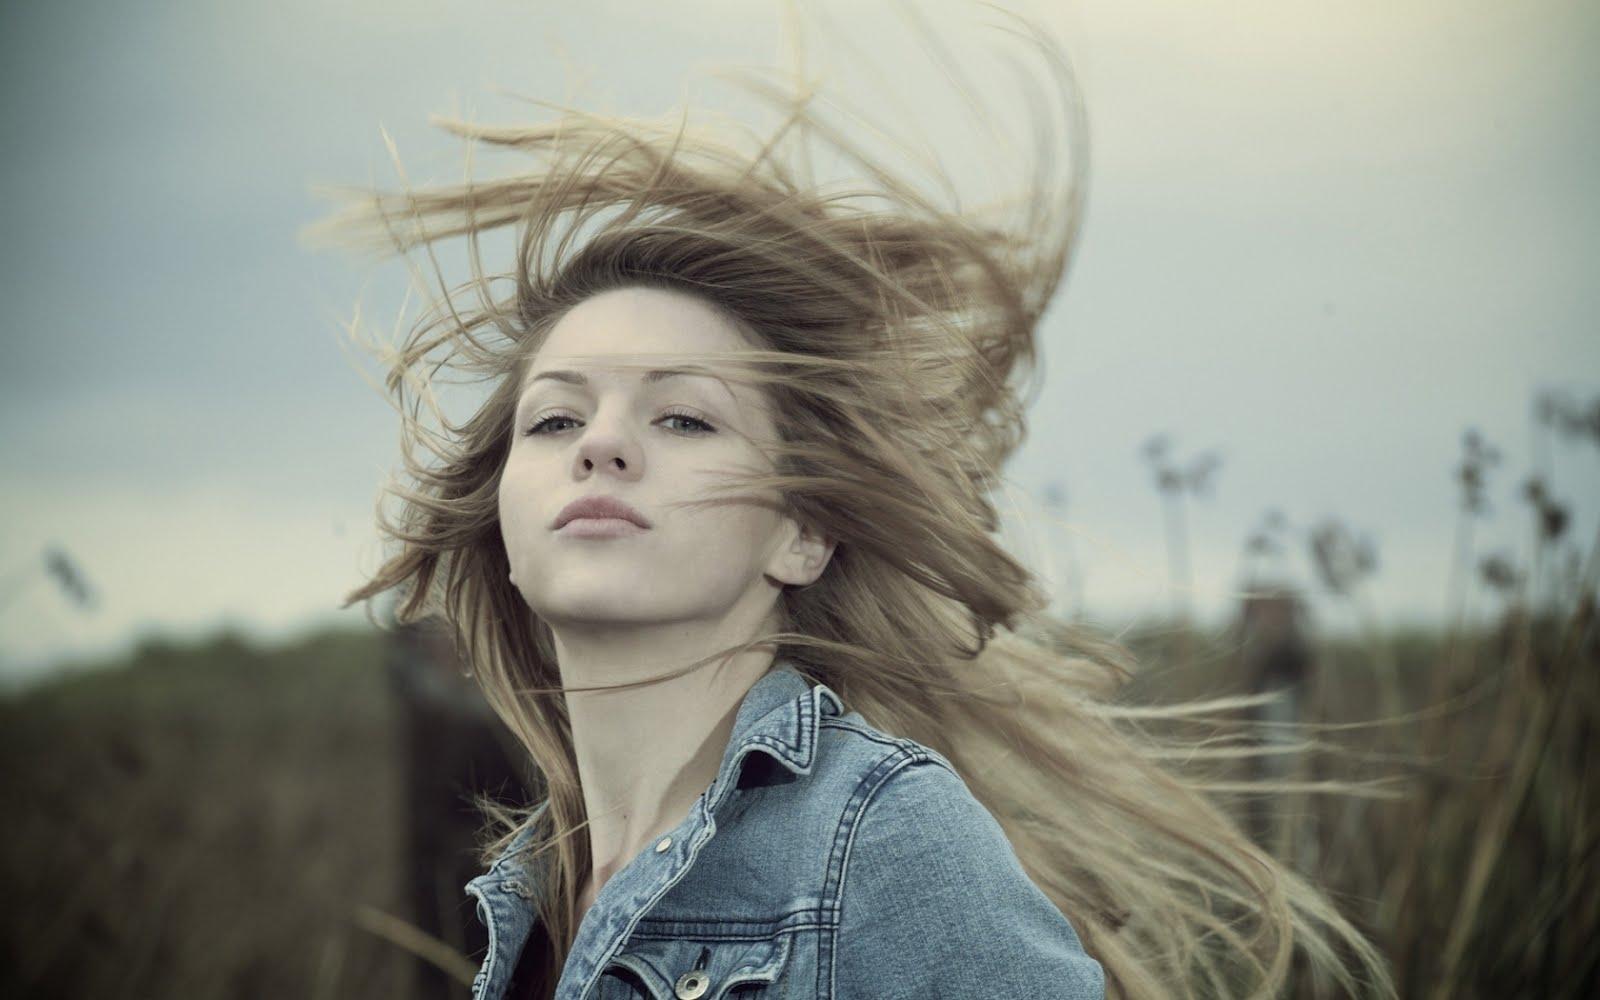 http://4.bp.blogspot.com/-if1yzin4qCI/UCwfmsTrHxI/AAAAAAAAB_M/FZco_8Kdi6w/s1600/girl_brunette_field_grass_wind_mood_29082_1680x1050.jpg